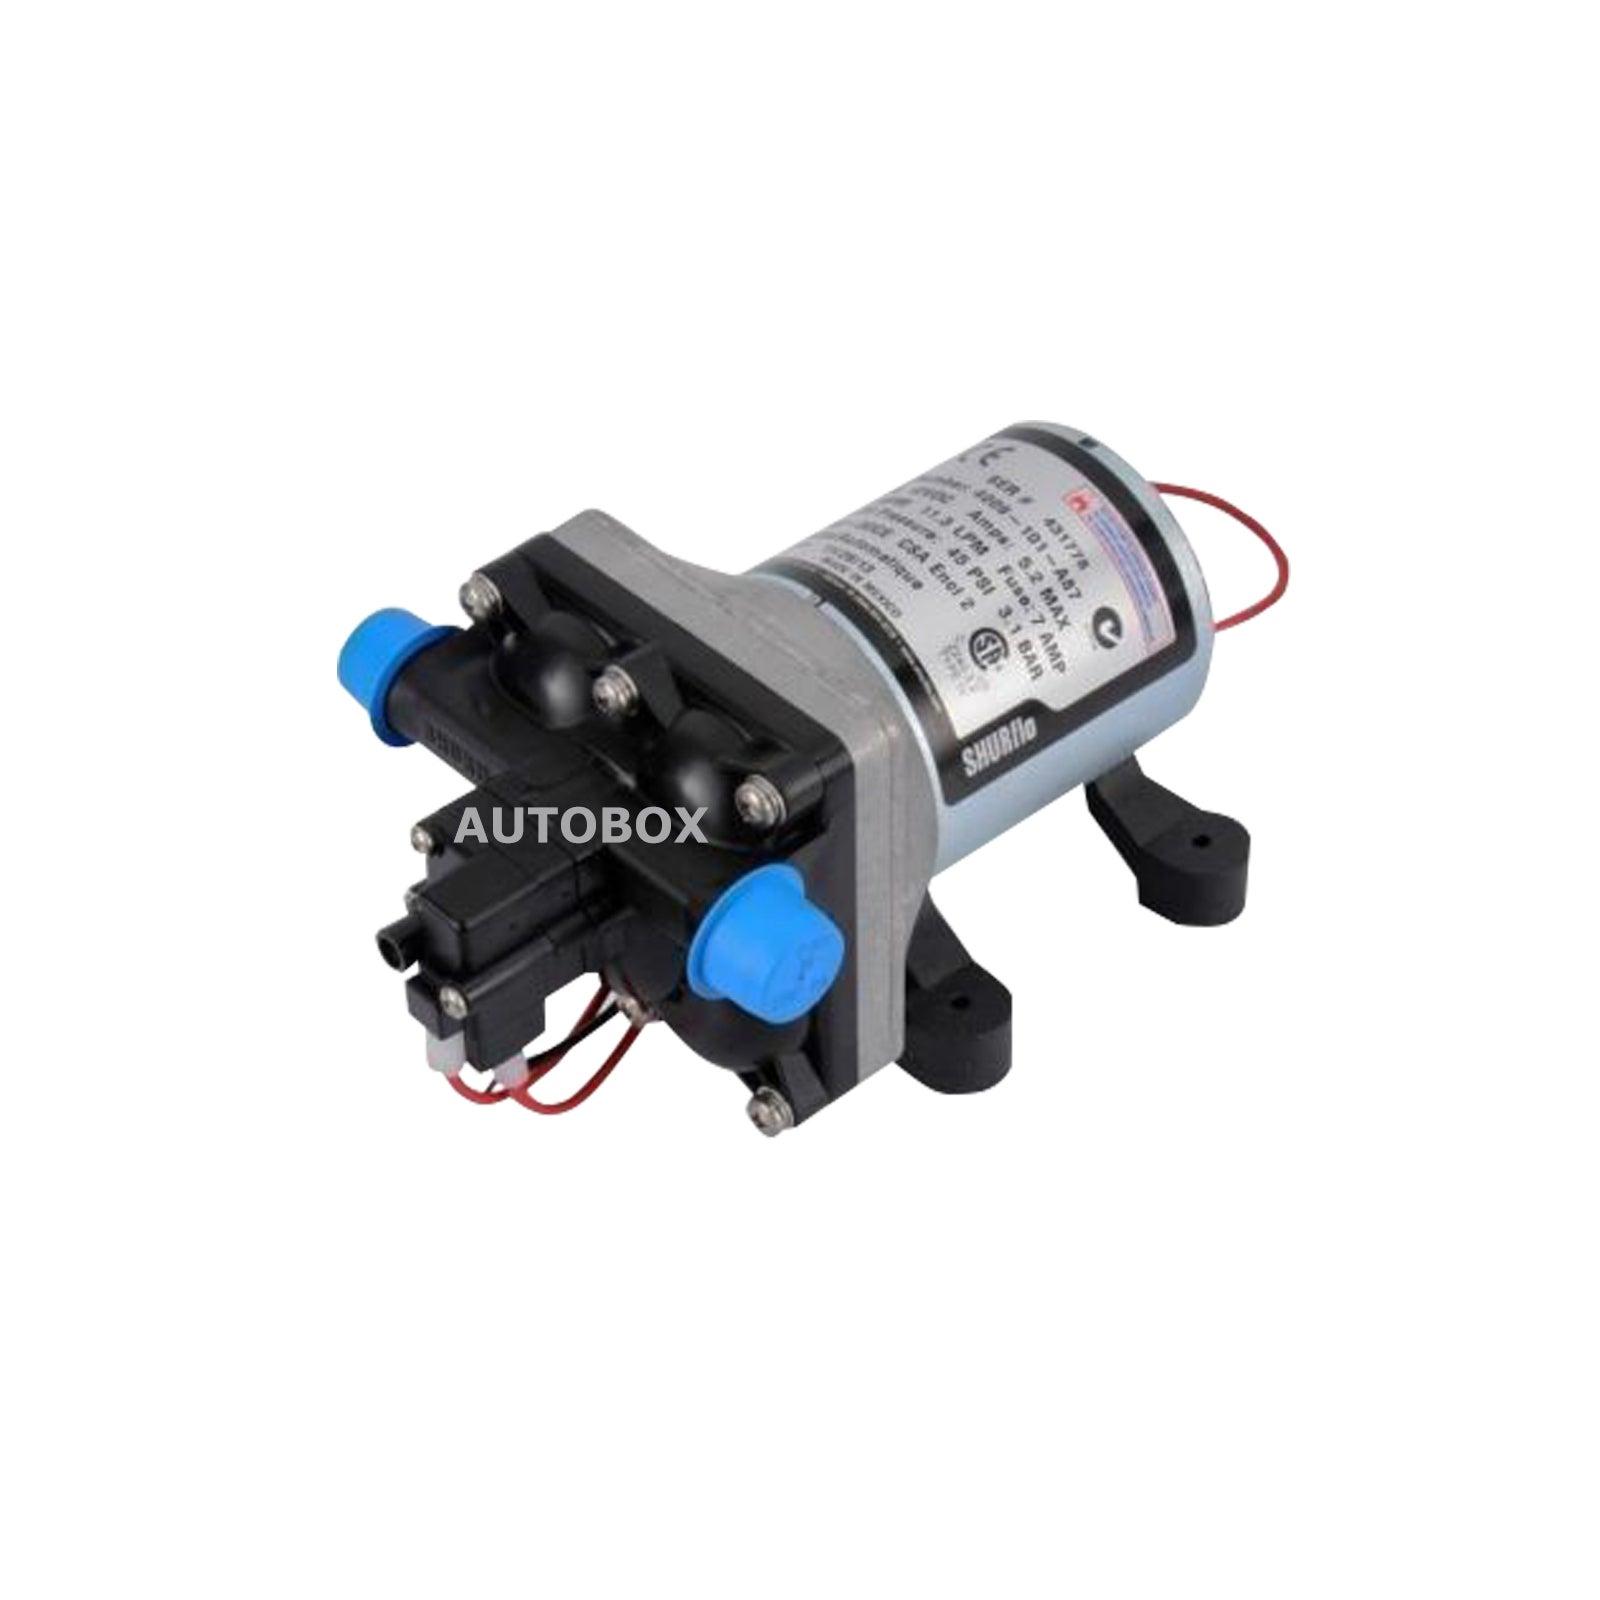 SHURflo Revolution 4009 12 volt Caravan Water Pump Camper Trailer Motorhome RV